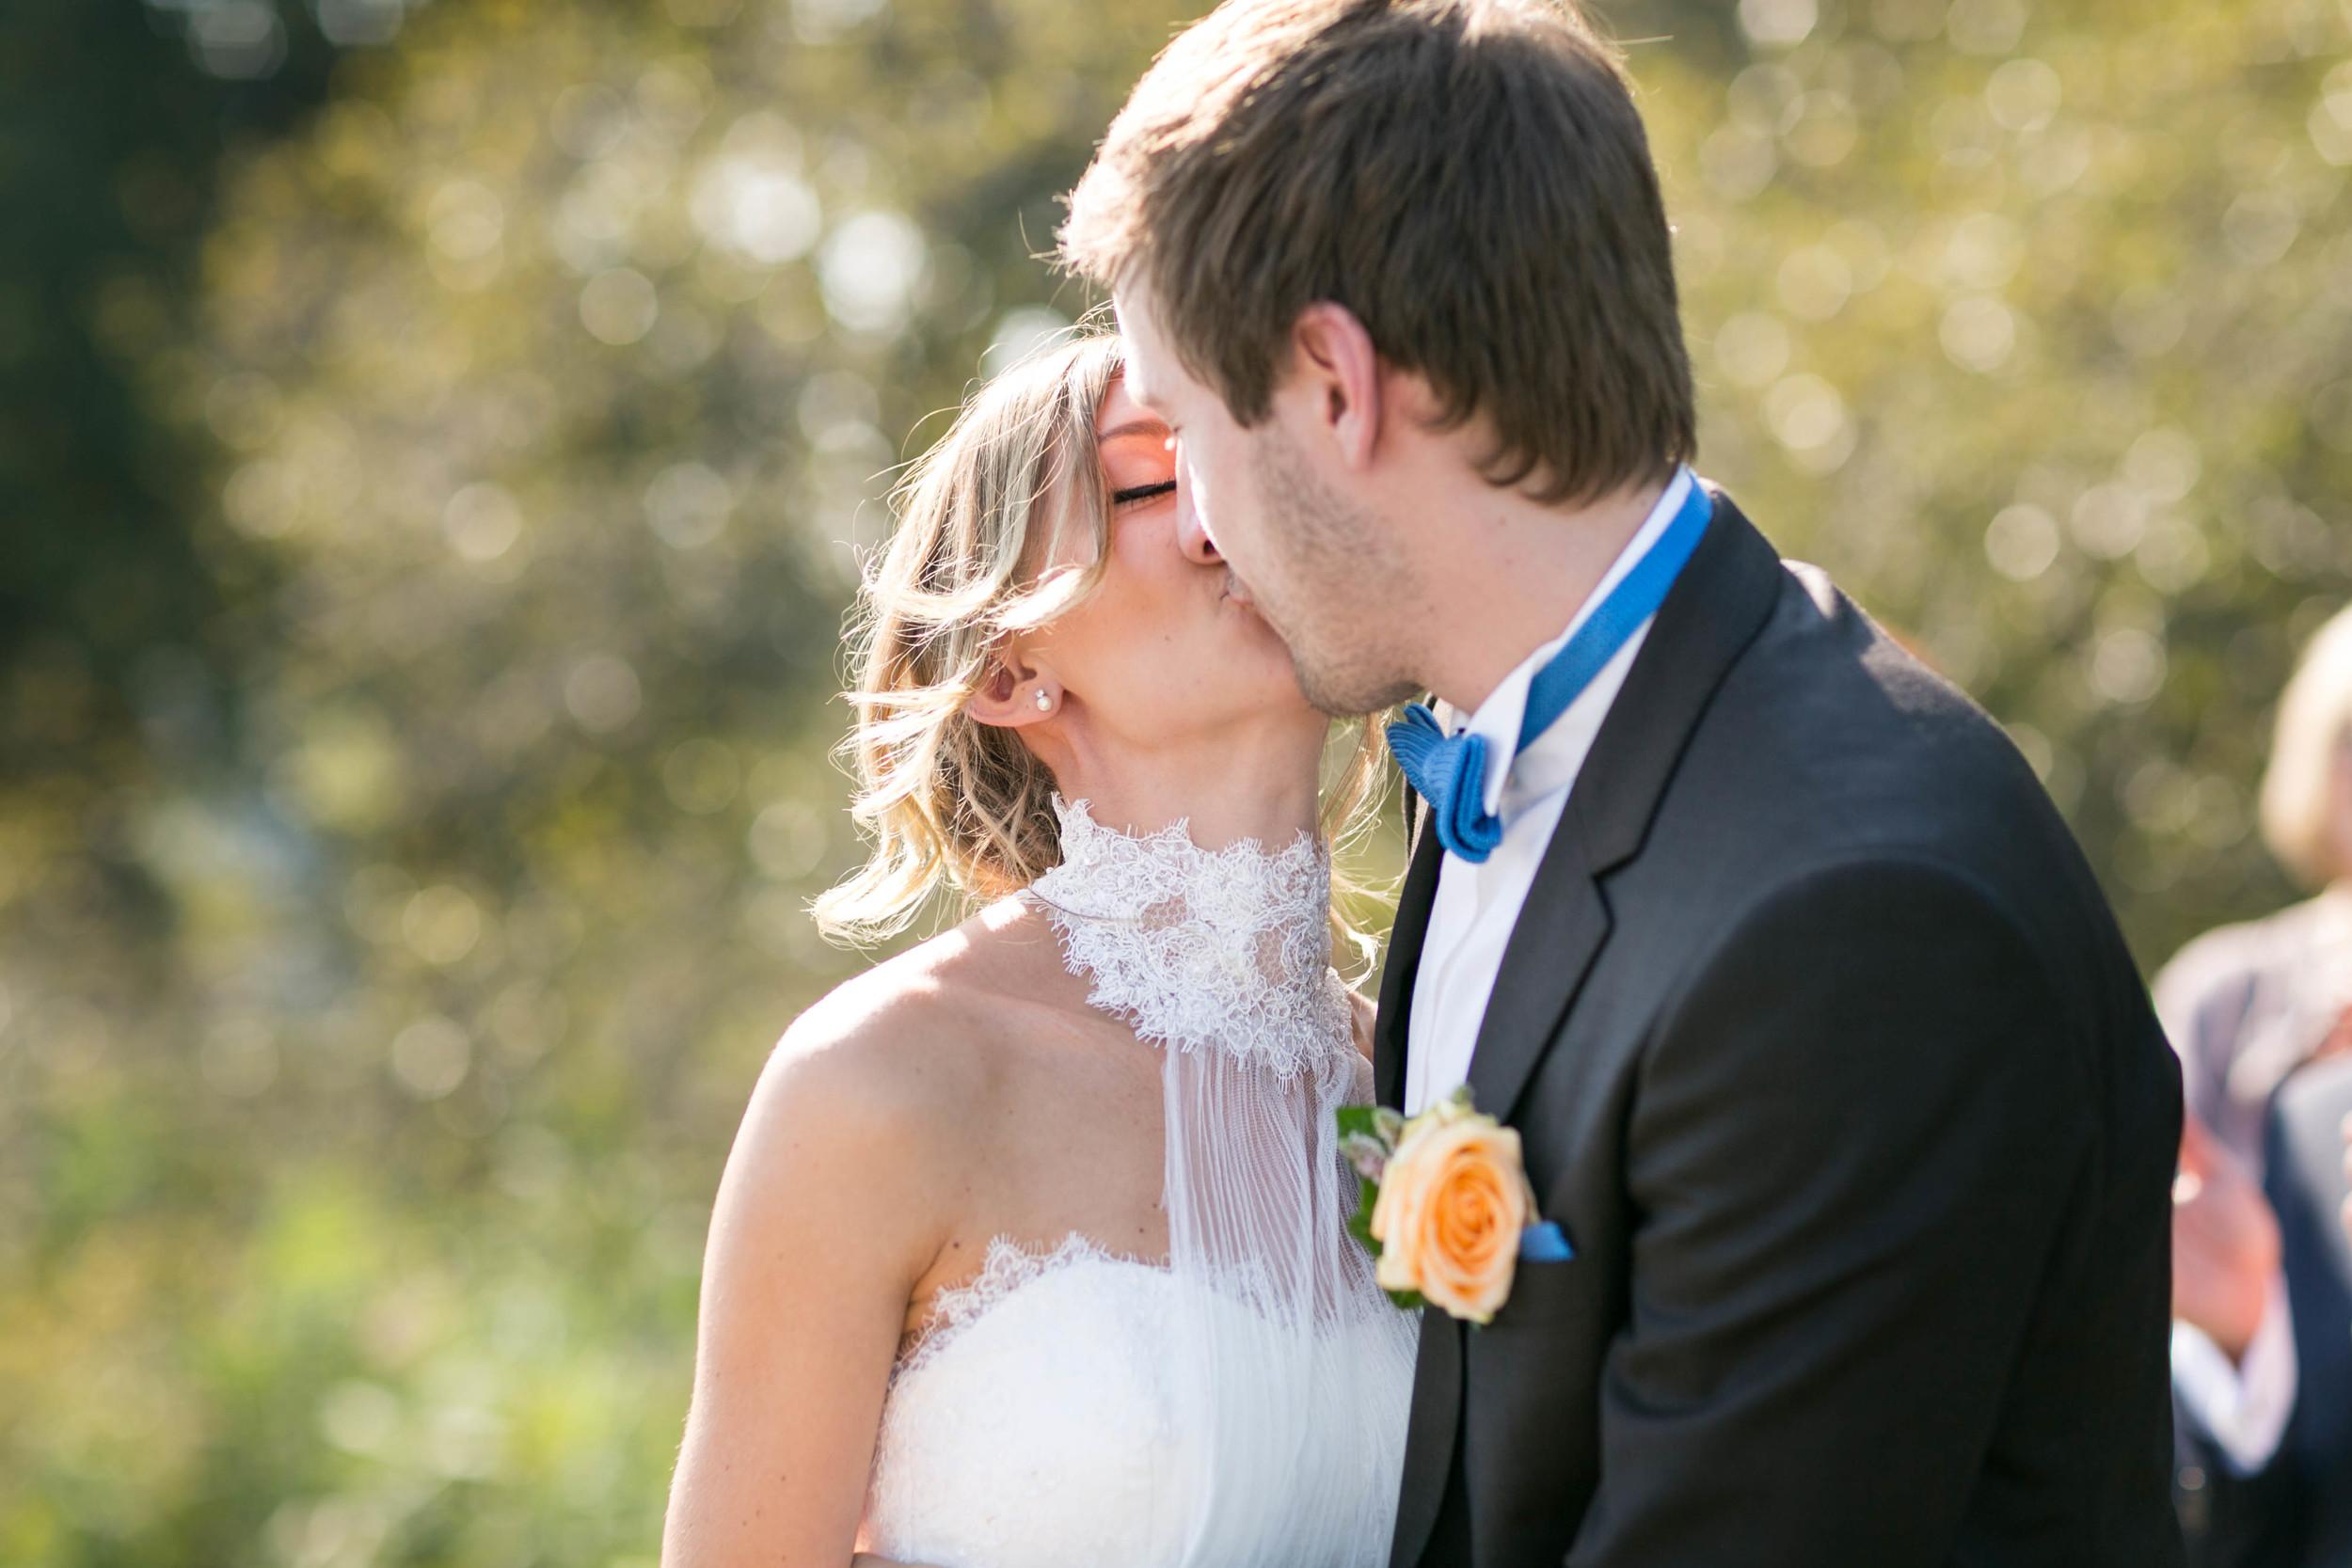 Fran Burrows Hochzeitsfotografie_Kulturgut Wrechen Hochzeit-15.jpg